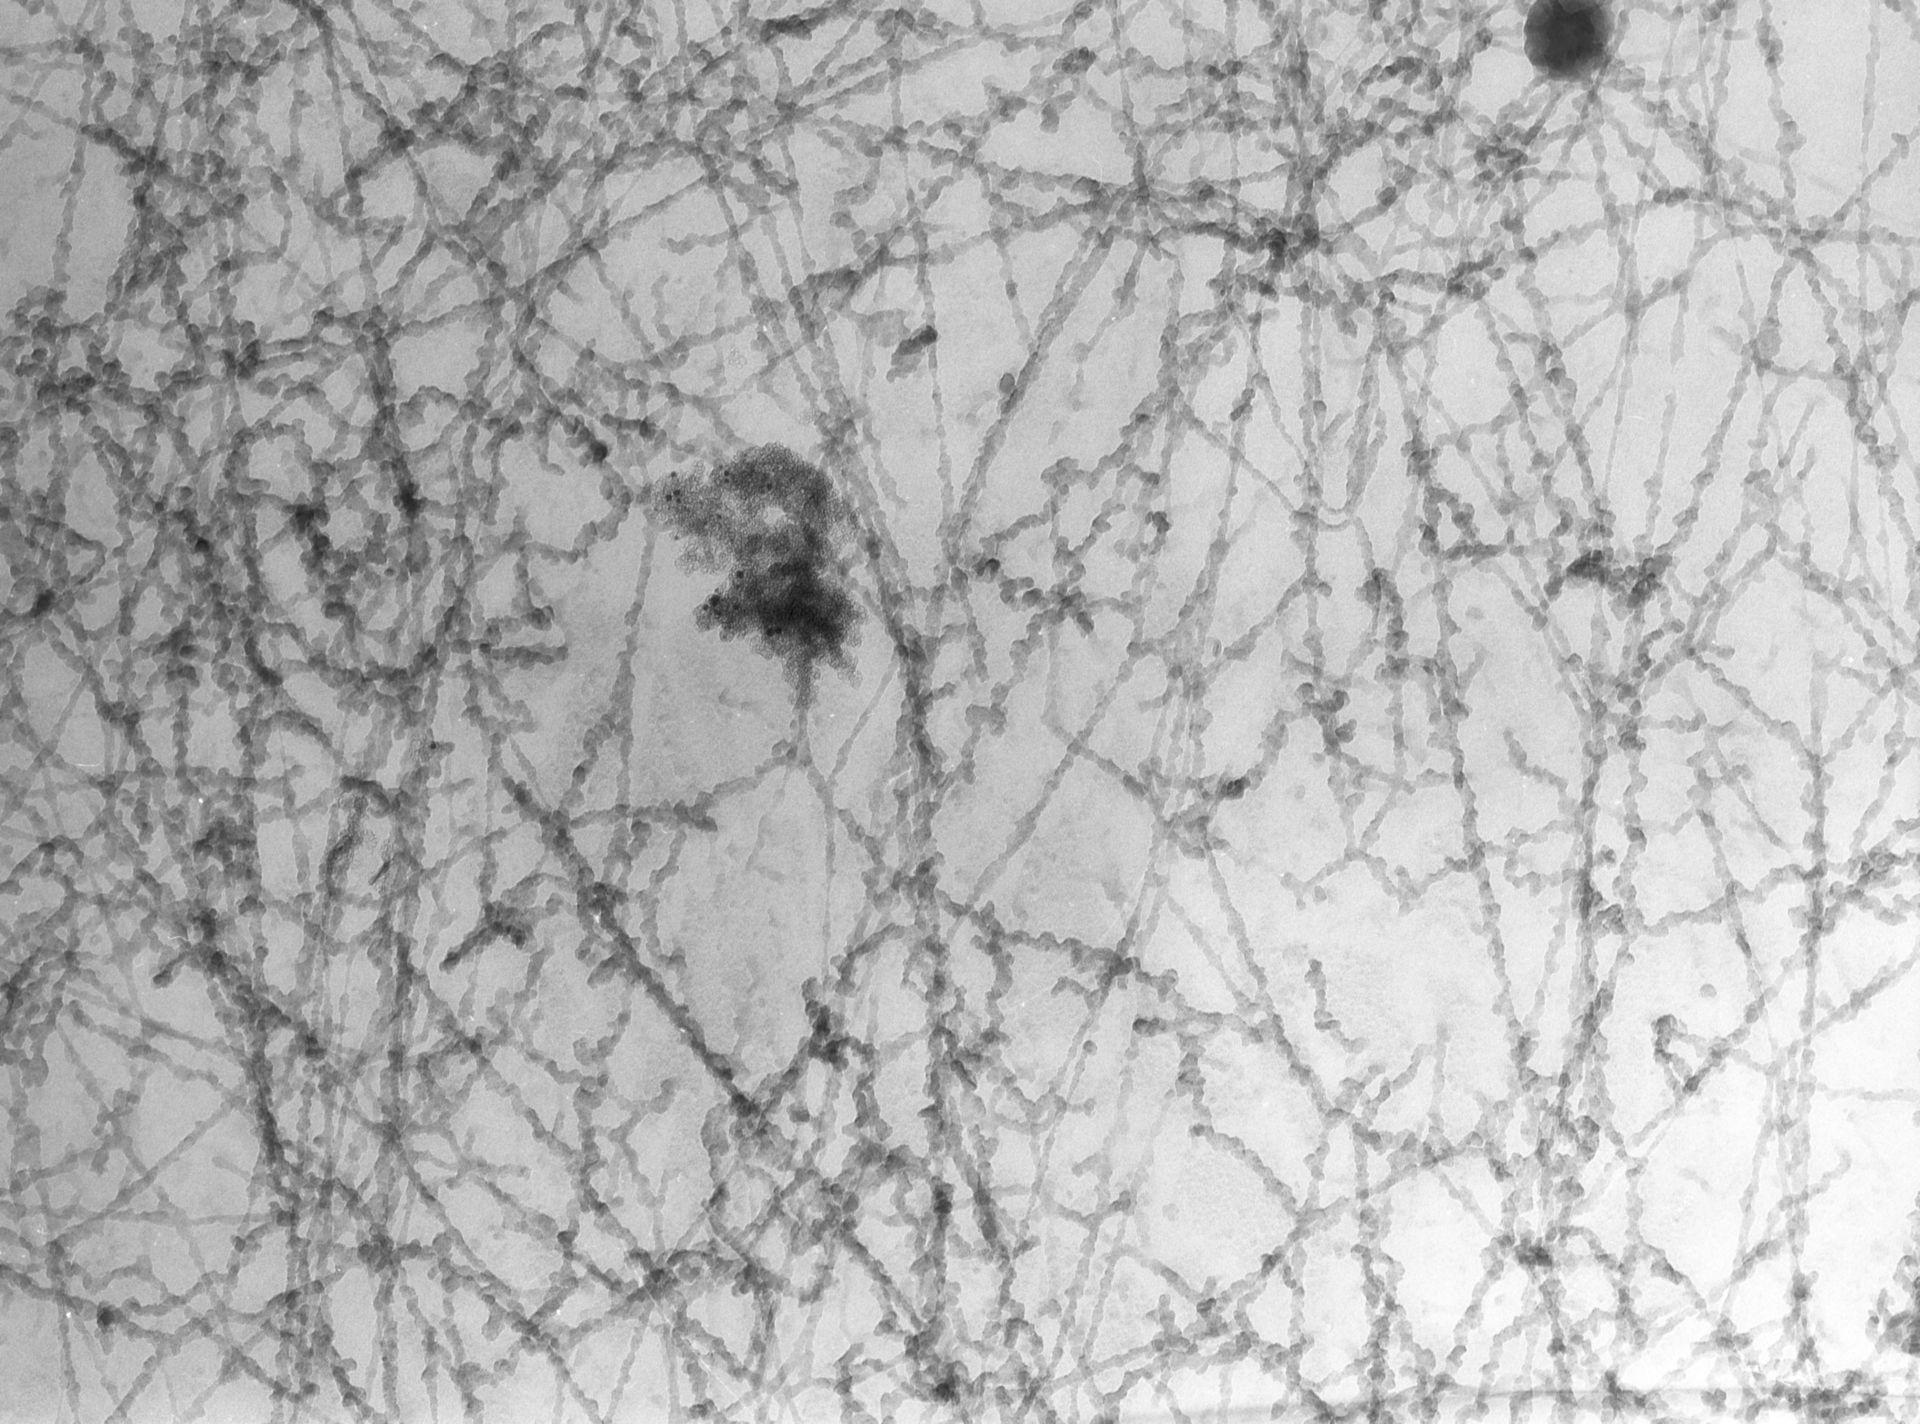 Notopthalmus viridescence (Nuclear chromatin) - CIL:10083